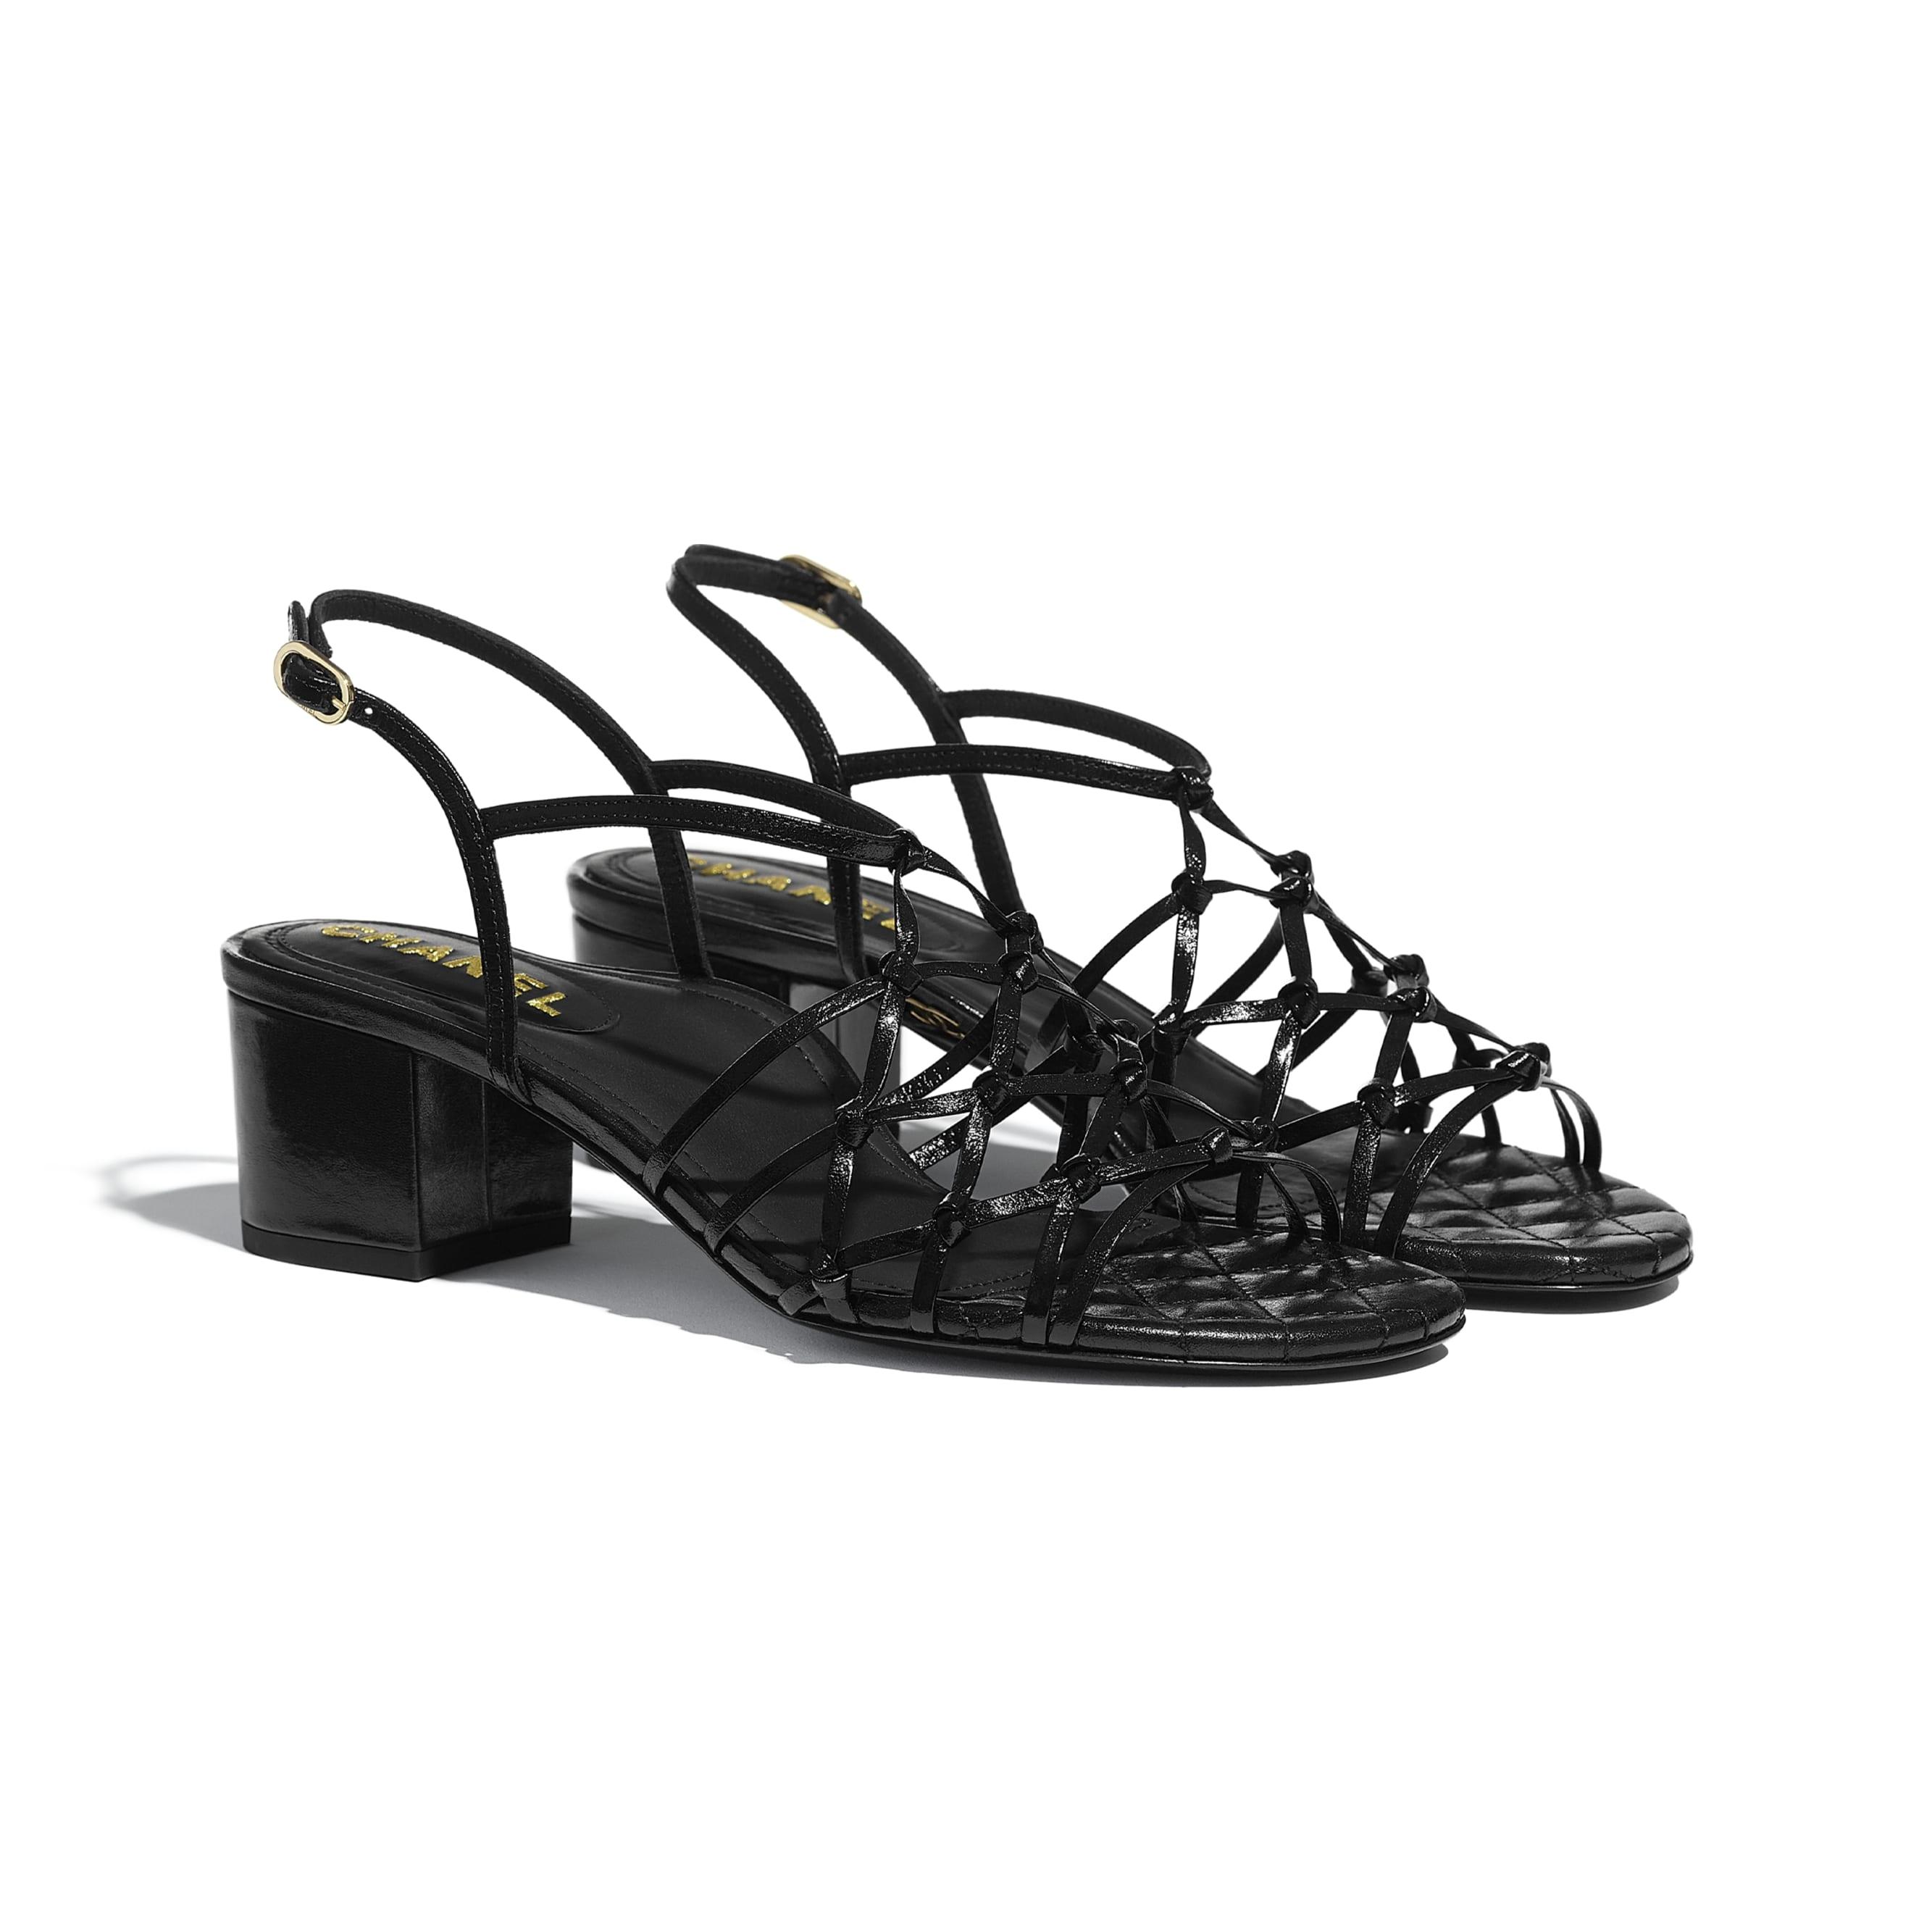 Sandals - Black - Iridescent Calfskin - CHANEL - Alternative view - see standard sized version